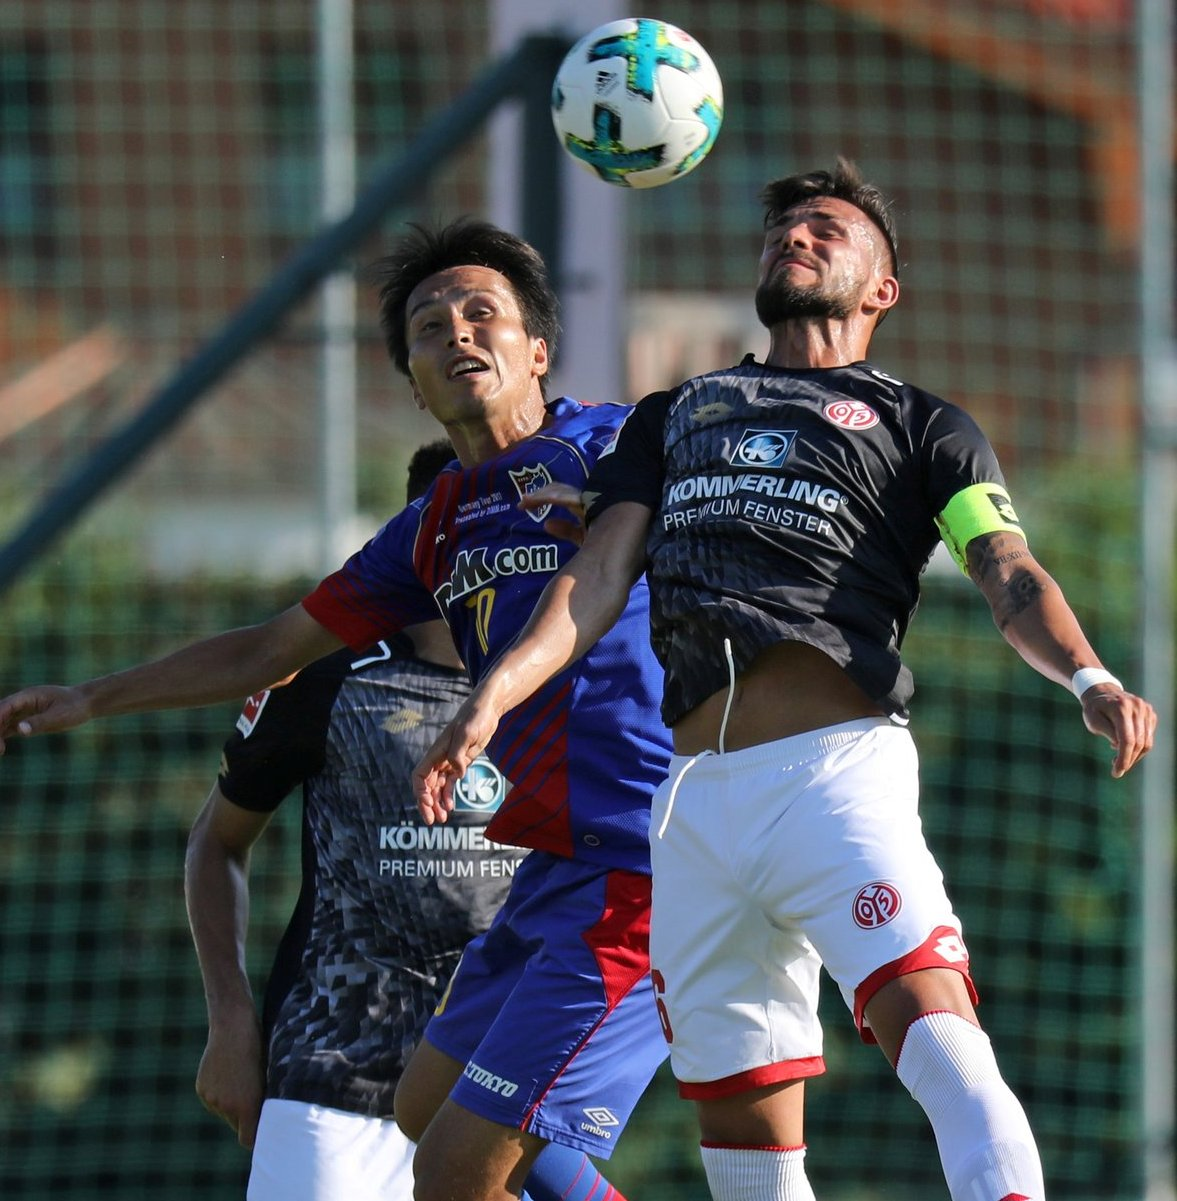 Utaka Scores, Balogun In Action In Pre-Season Clash